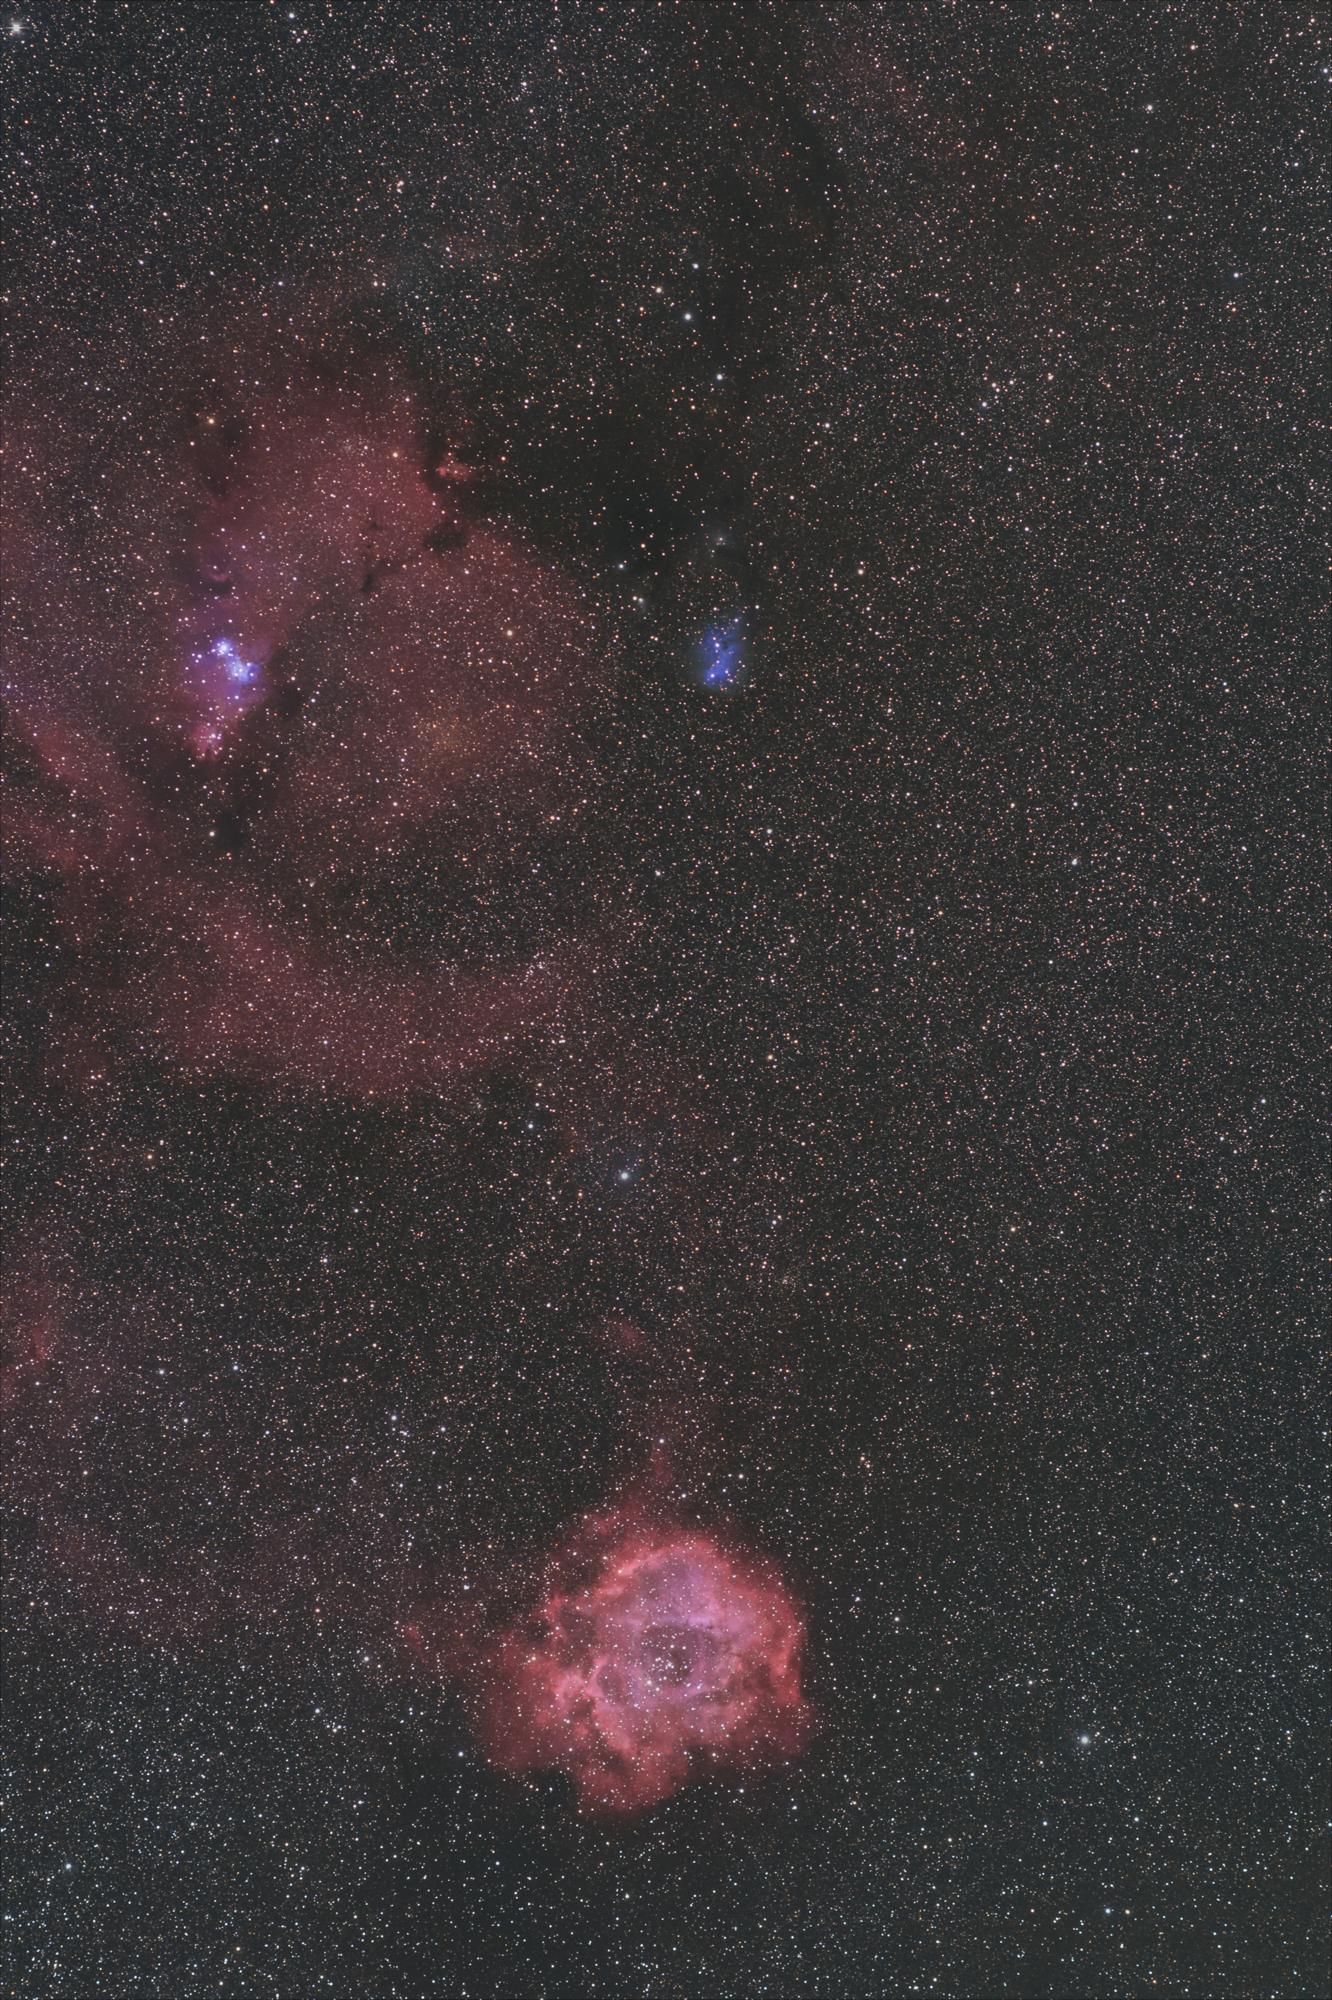 f:id:snct-astro:20180119192517j:plain